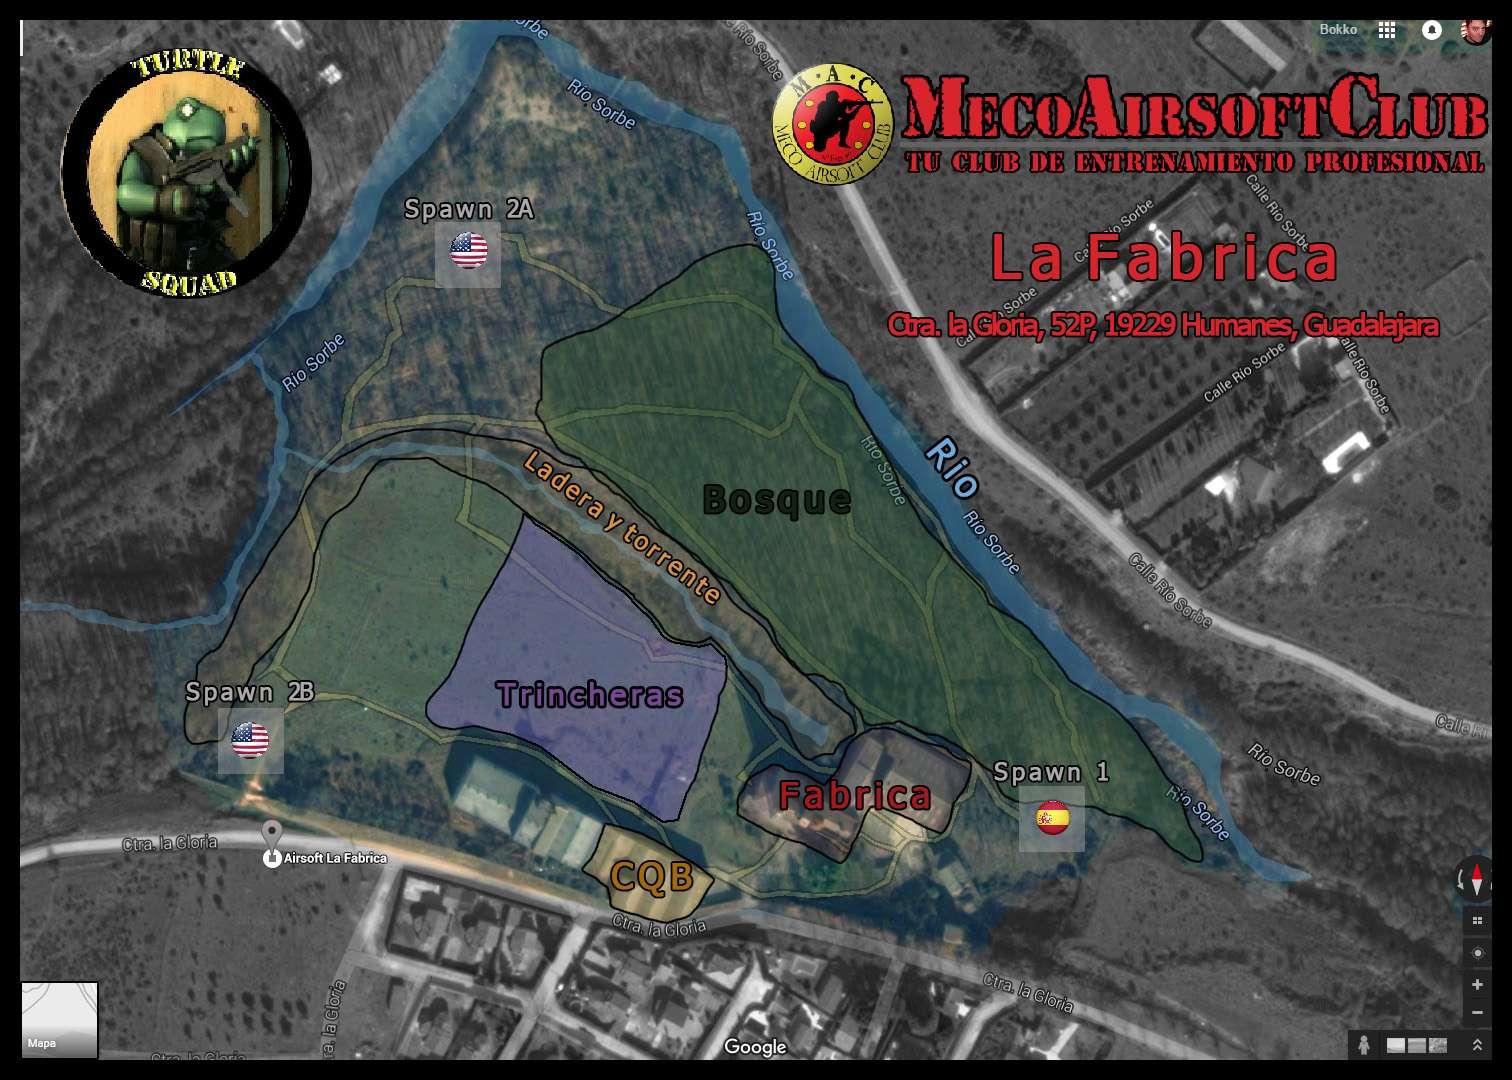 La fábrica - Meco Airsoft Club [Humanes - Guadalajara] Lafabr11